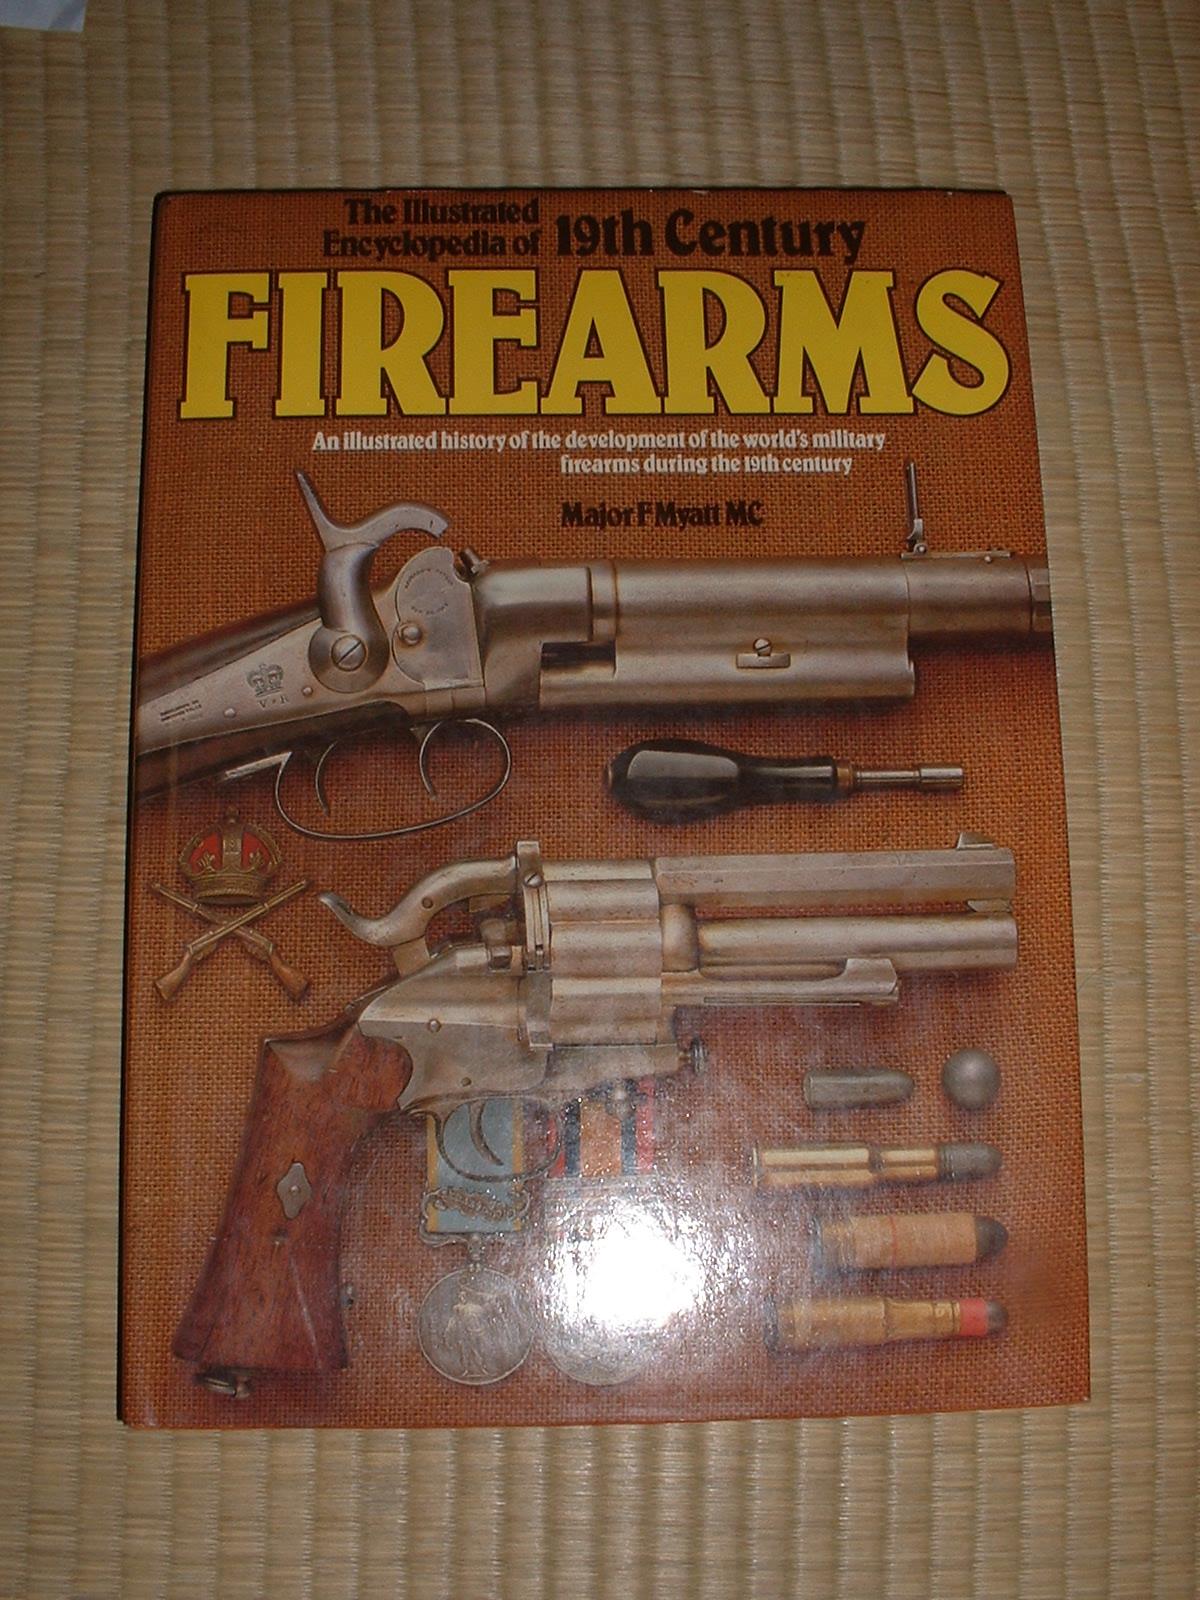 Frederlck Myatt著「The Illustraled Encyclopeia of 19th FIRE ARMS」.JPG